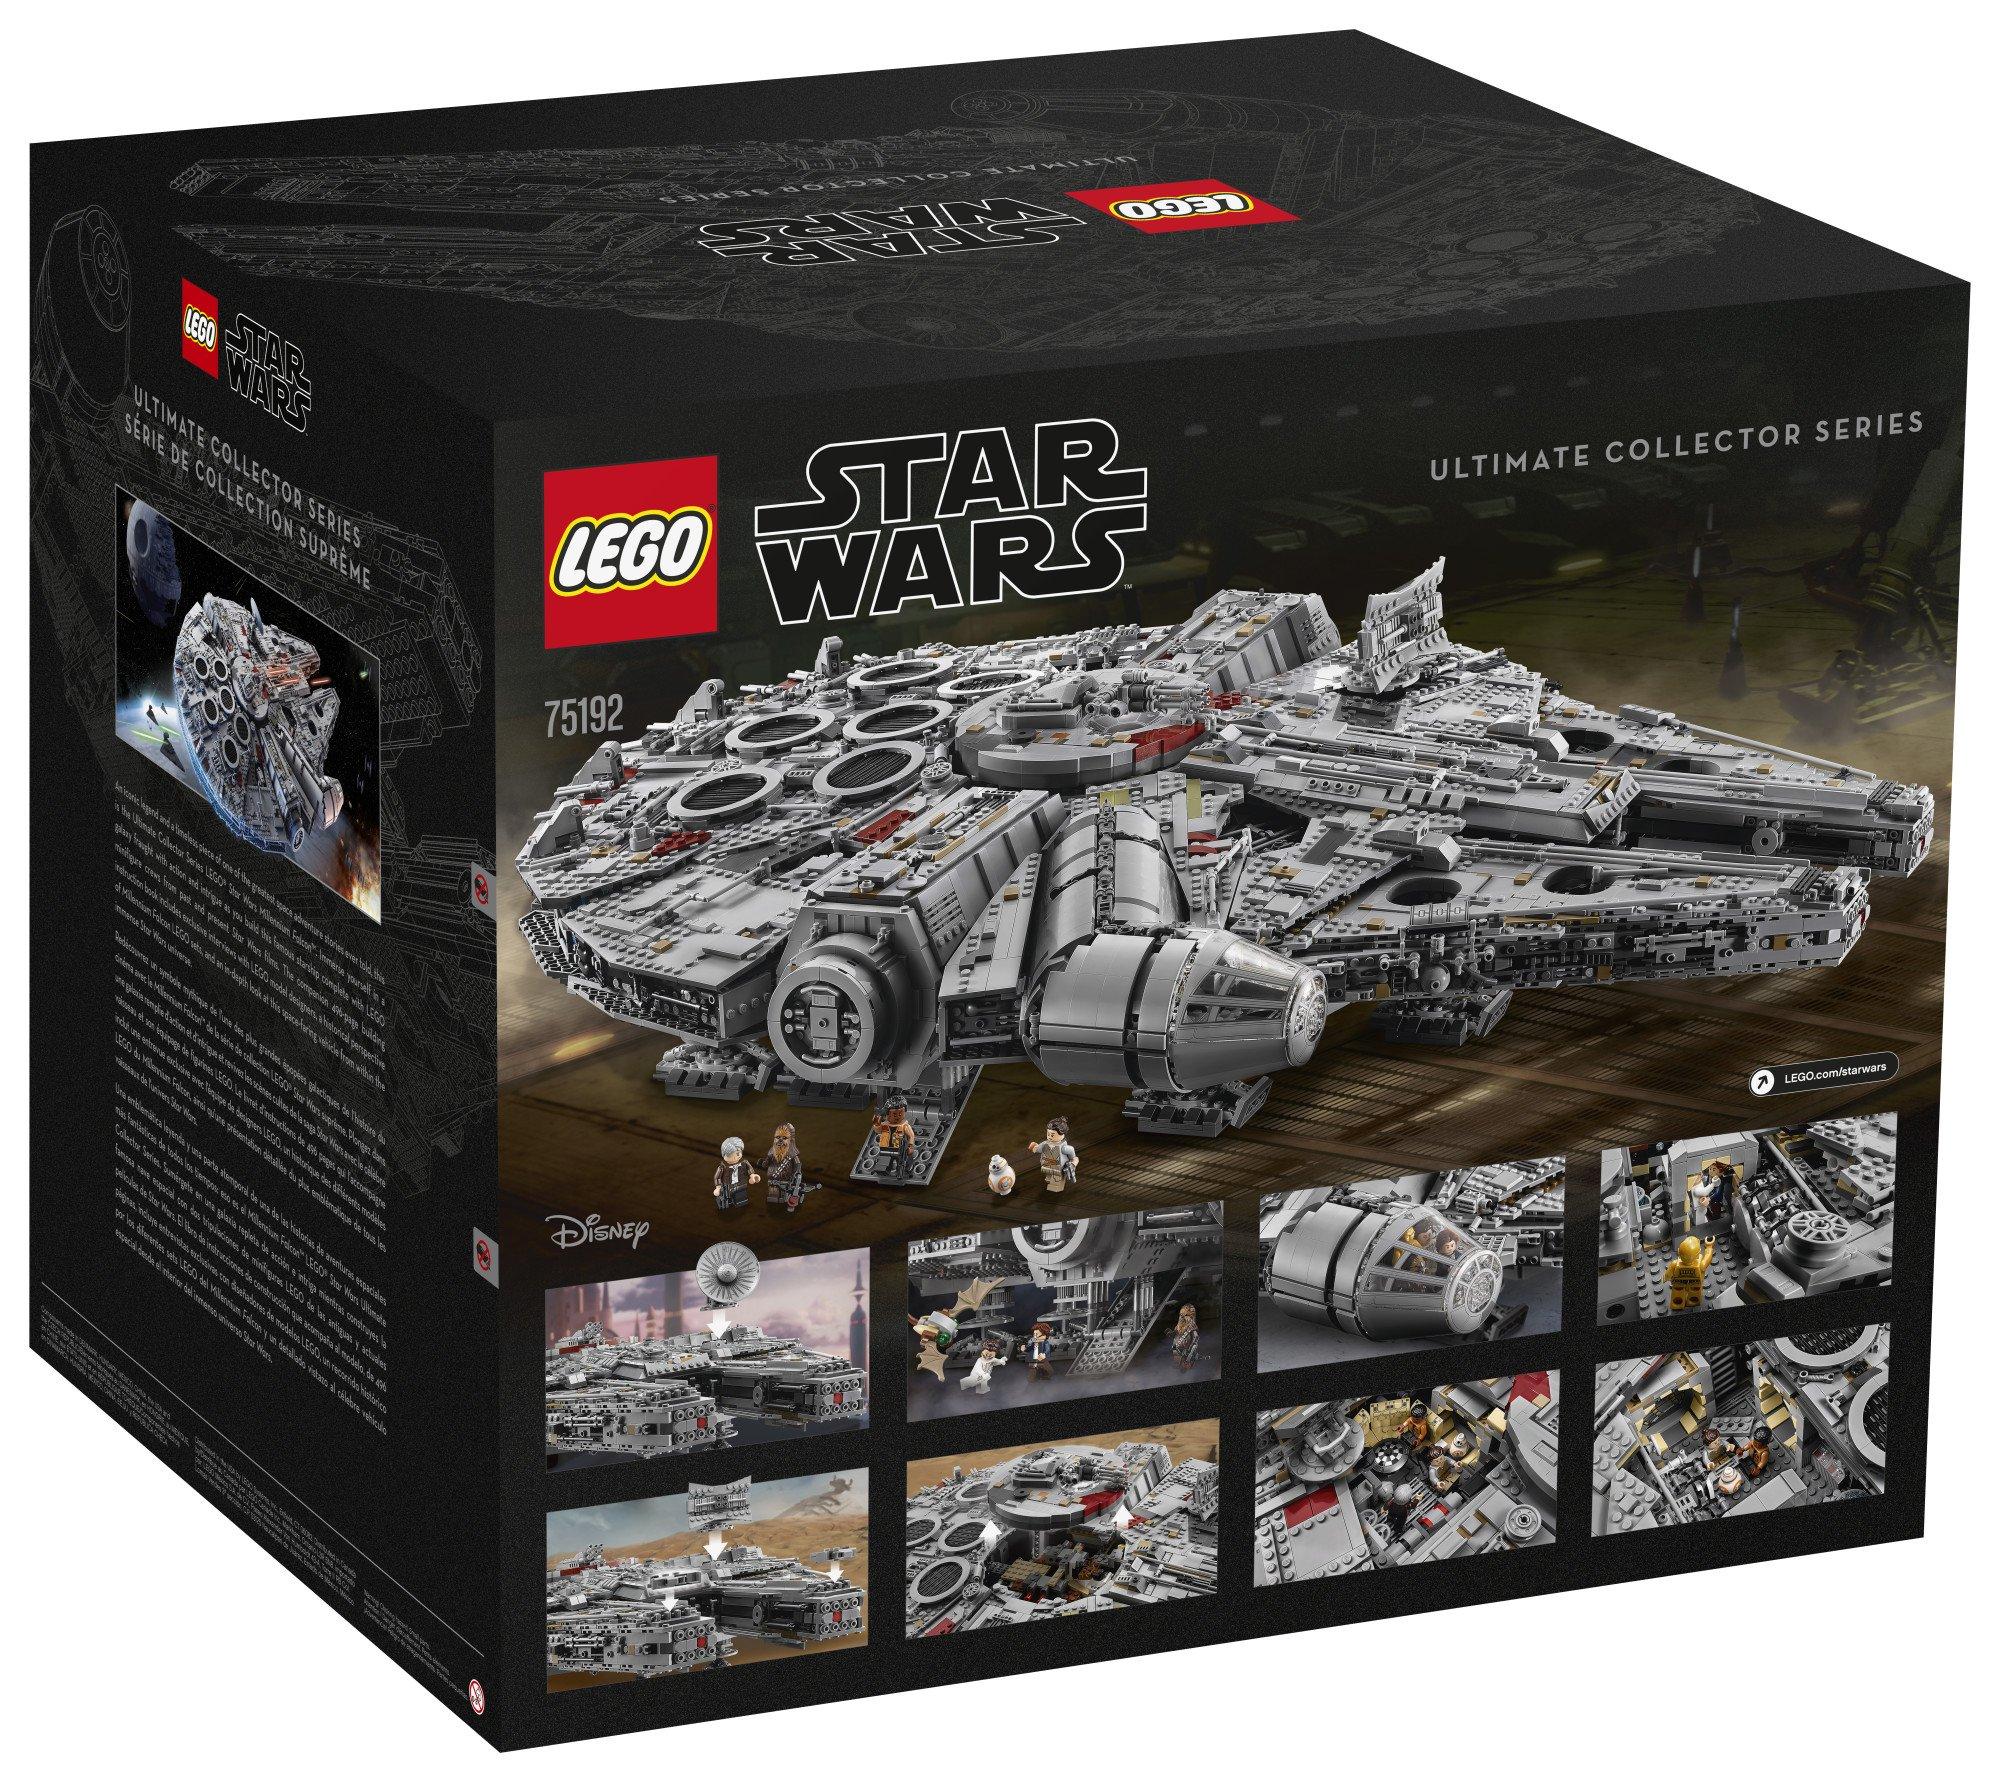 LEGO Star Wars Millennium Falcon 75192 Building Kit (7541 Piece) by LEGO (Image #5)